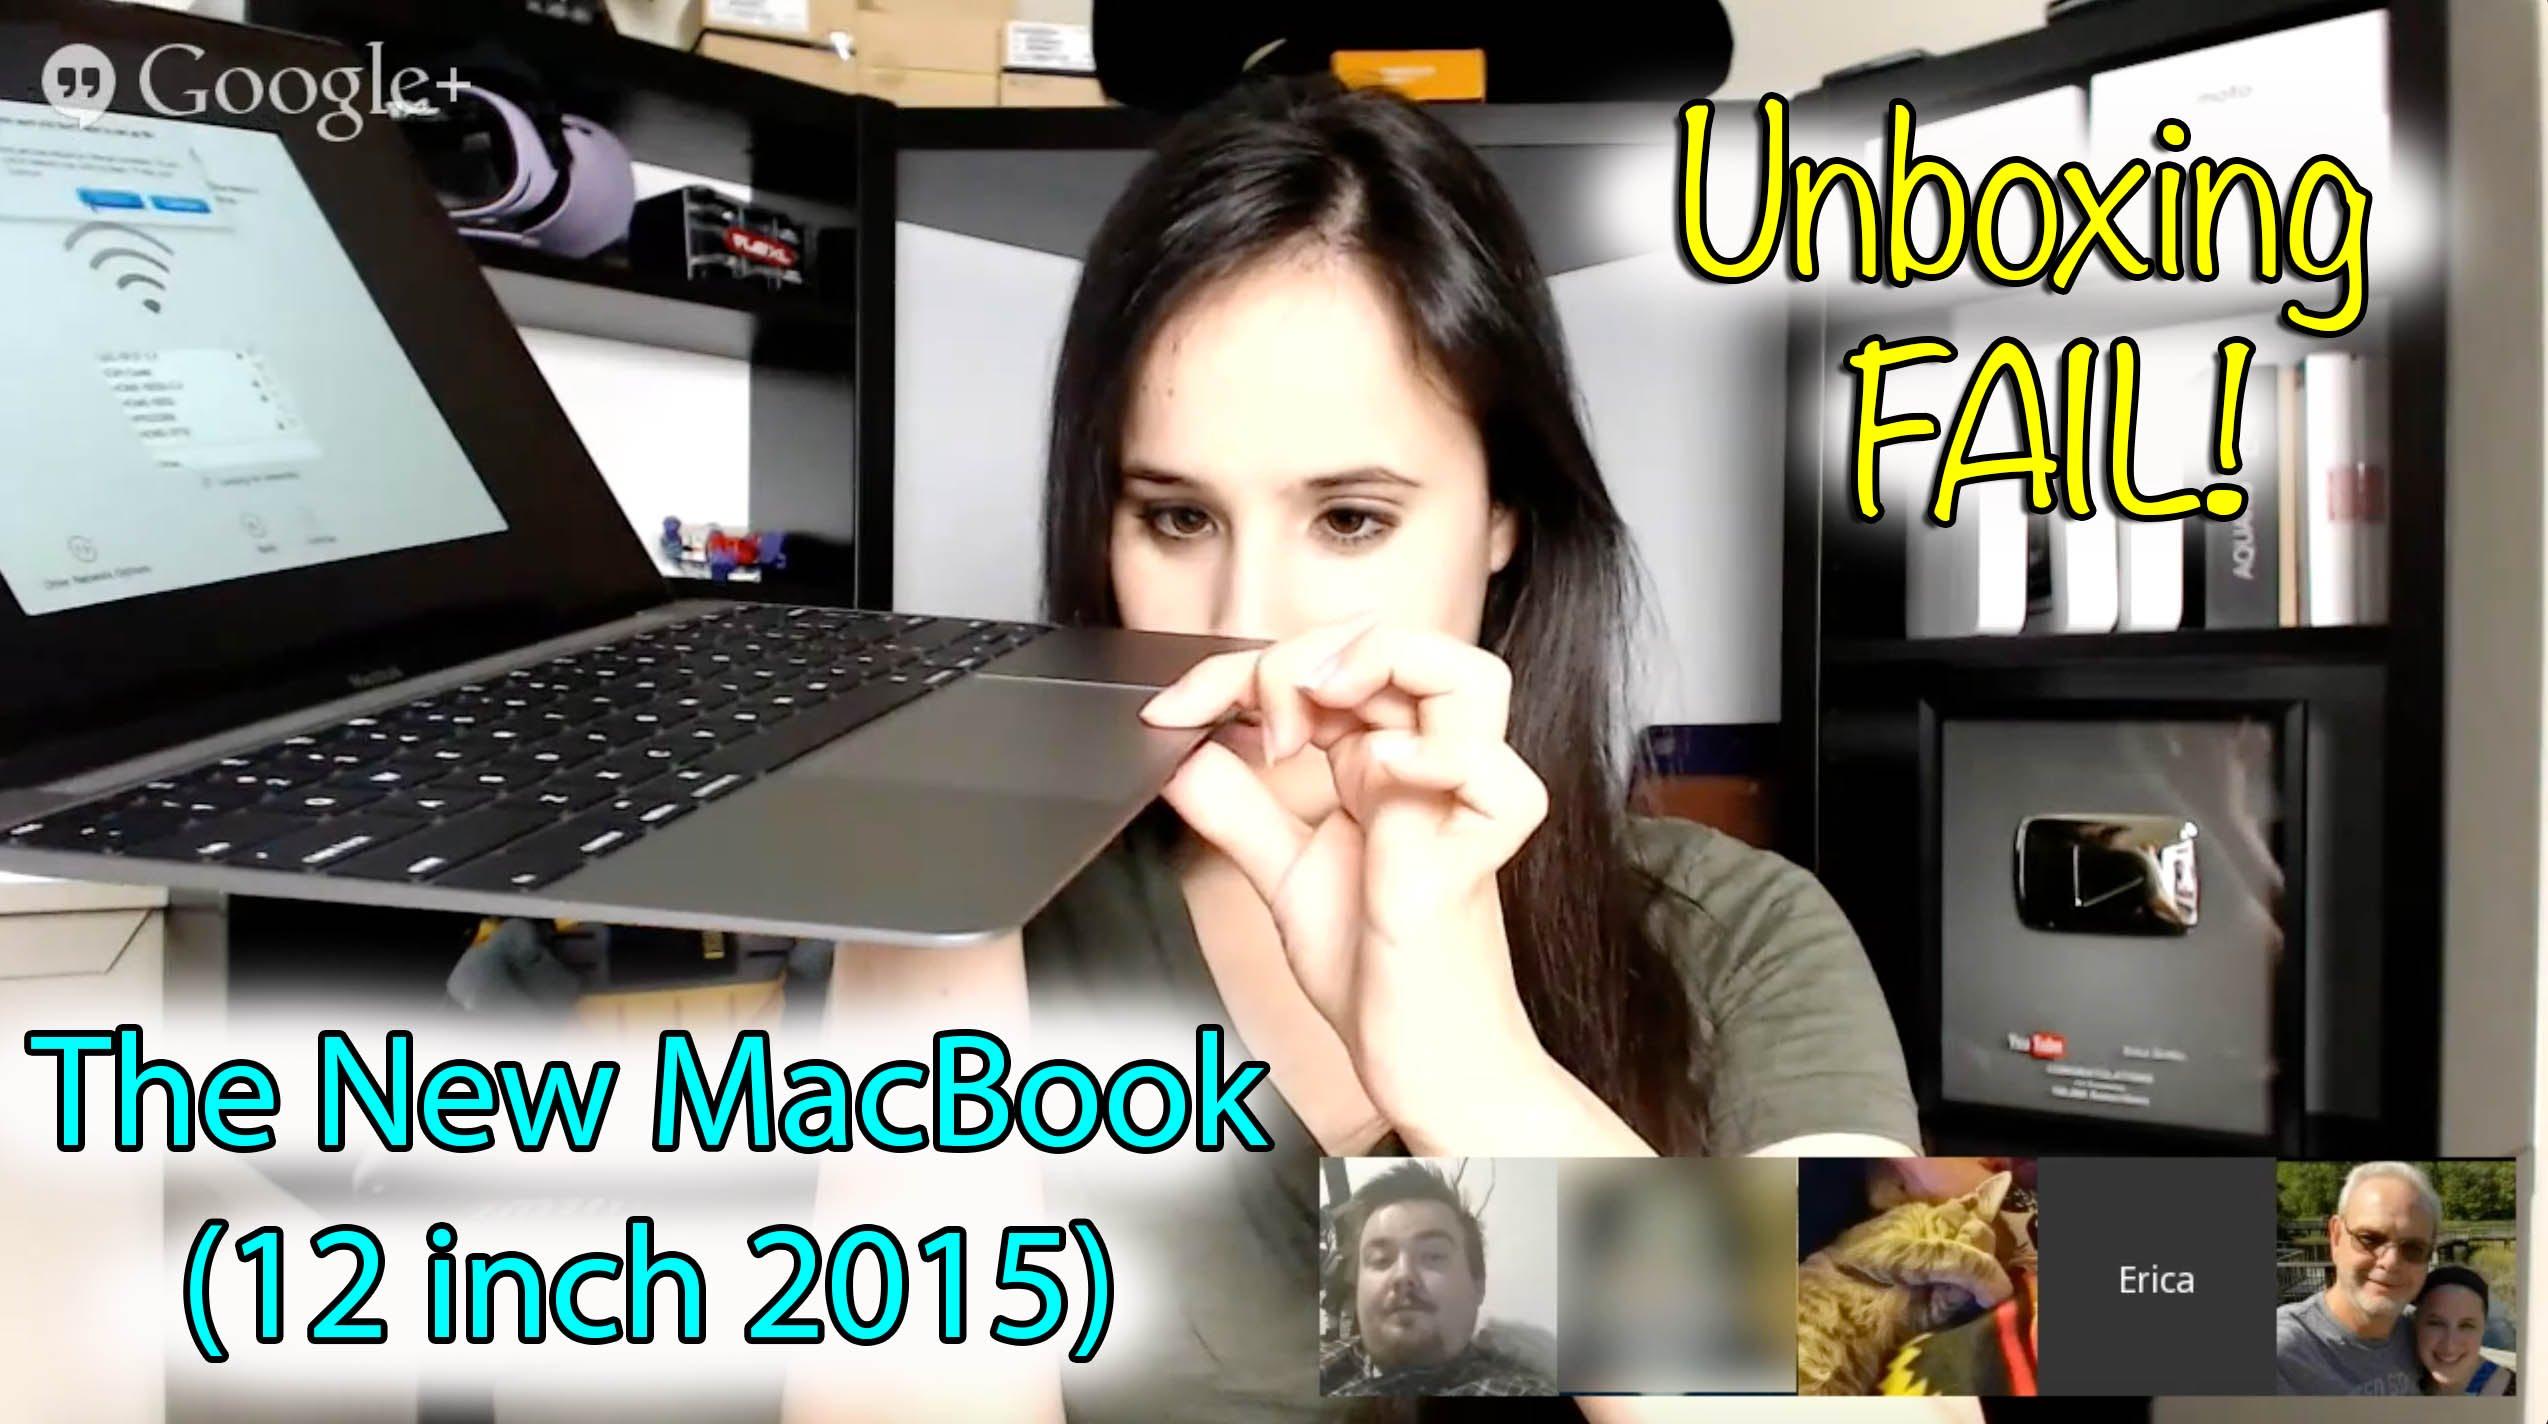 New MacBook 2015: Unboxing Fail/Google Hangout